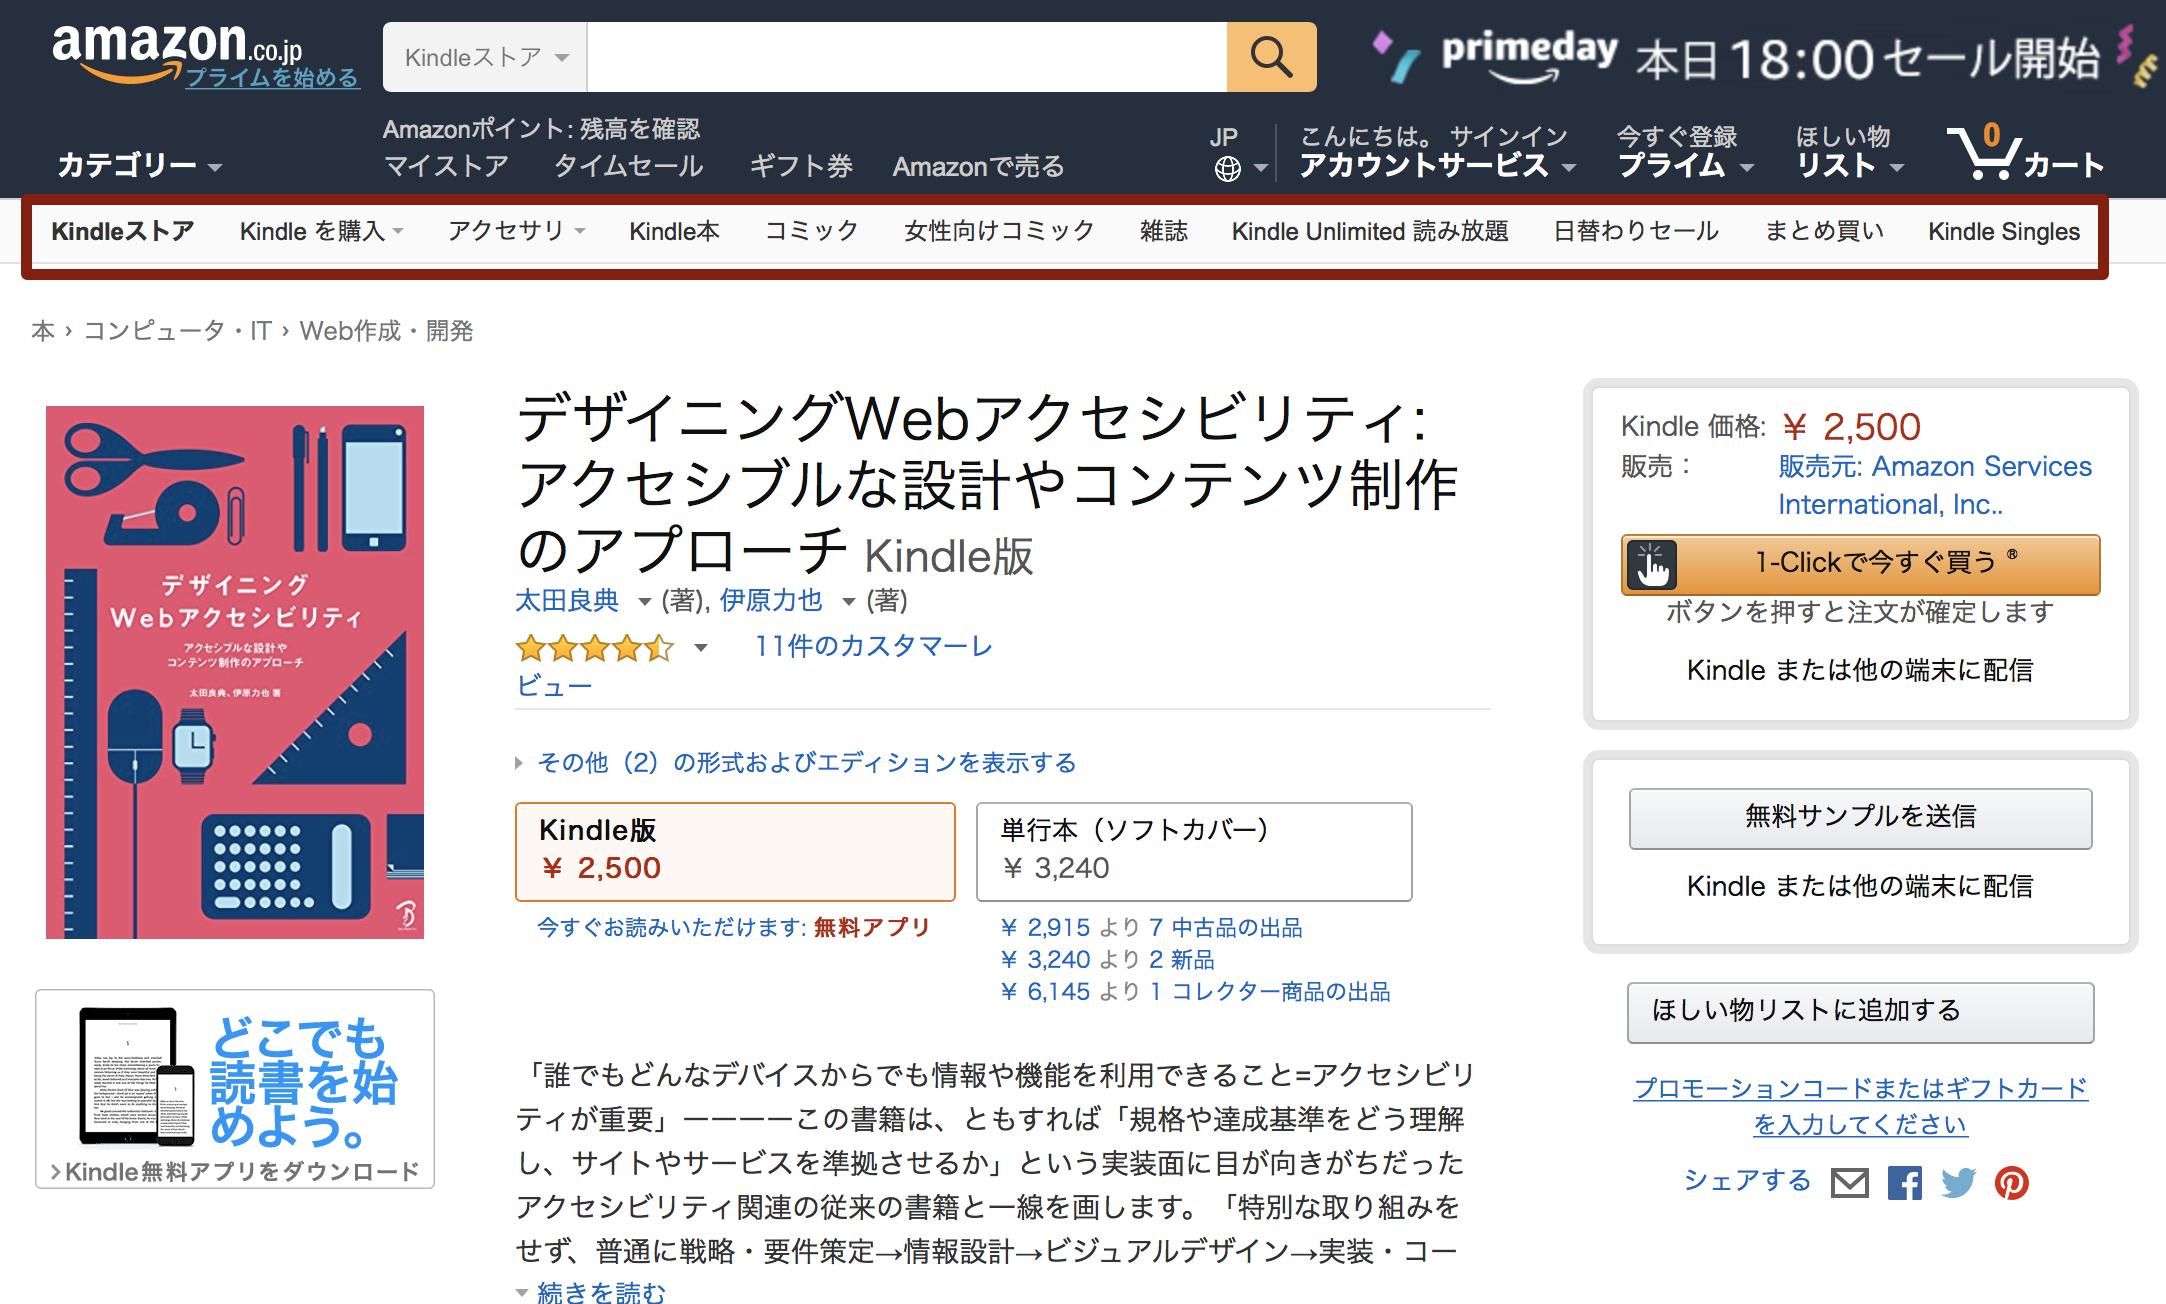 Amazon のナビゲーション表示